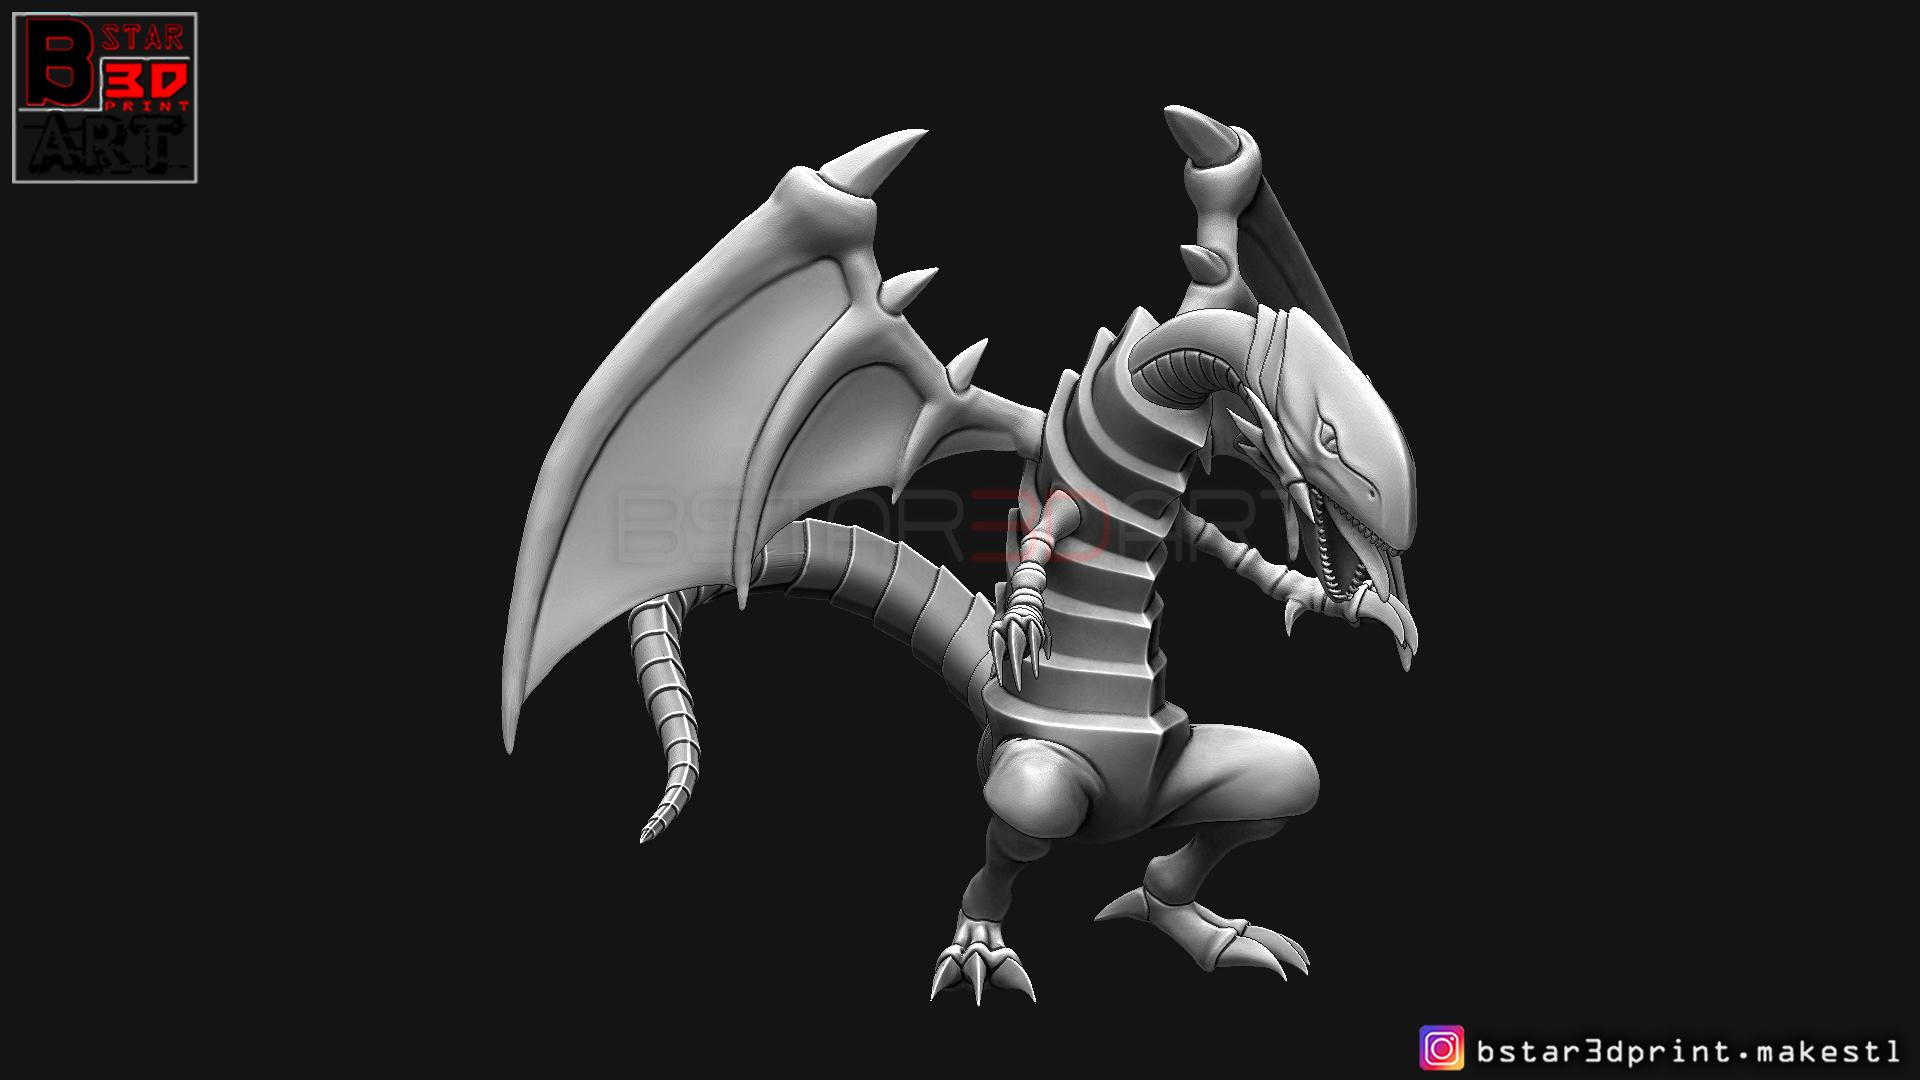 06.jpg Télécharger fichier STL yeux bleus dragon blanc - Yu Gi Oh • Modèle à imprimer en 3D, Bstar3Dart